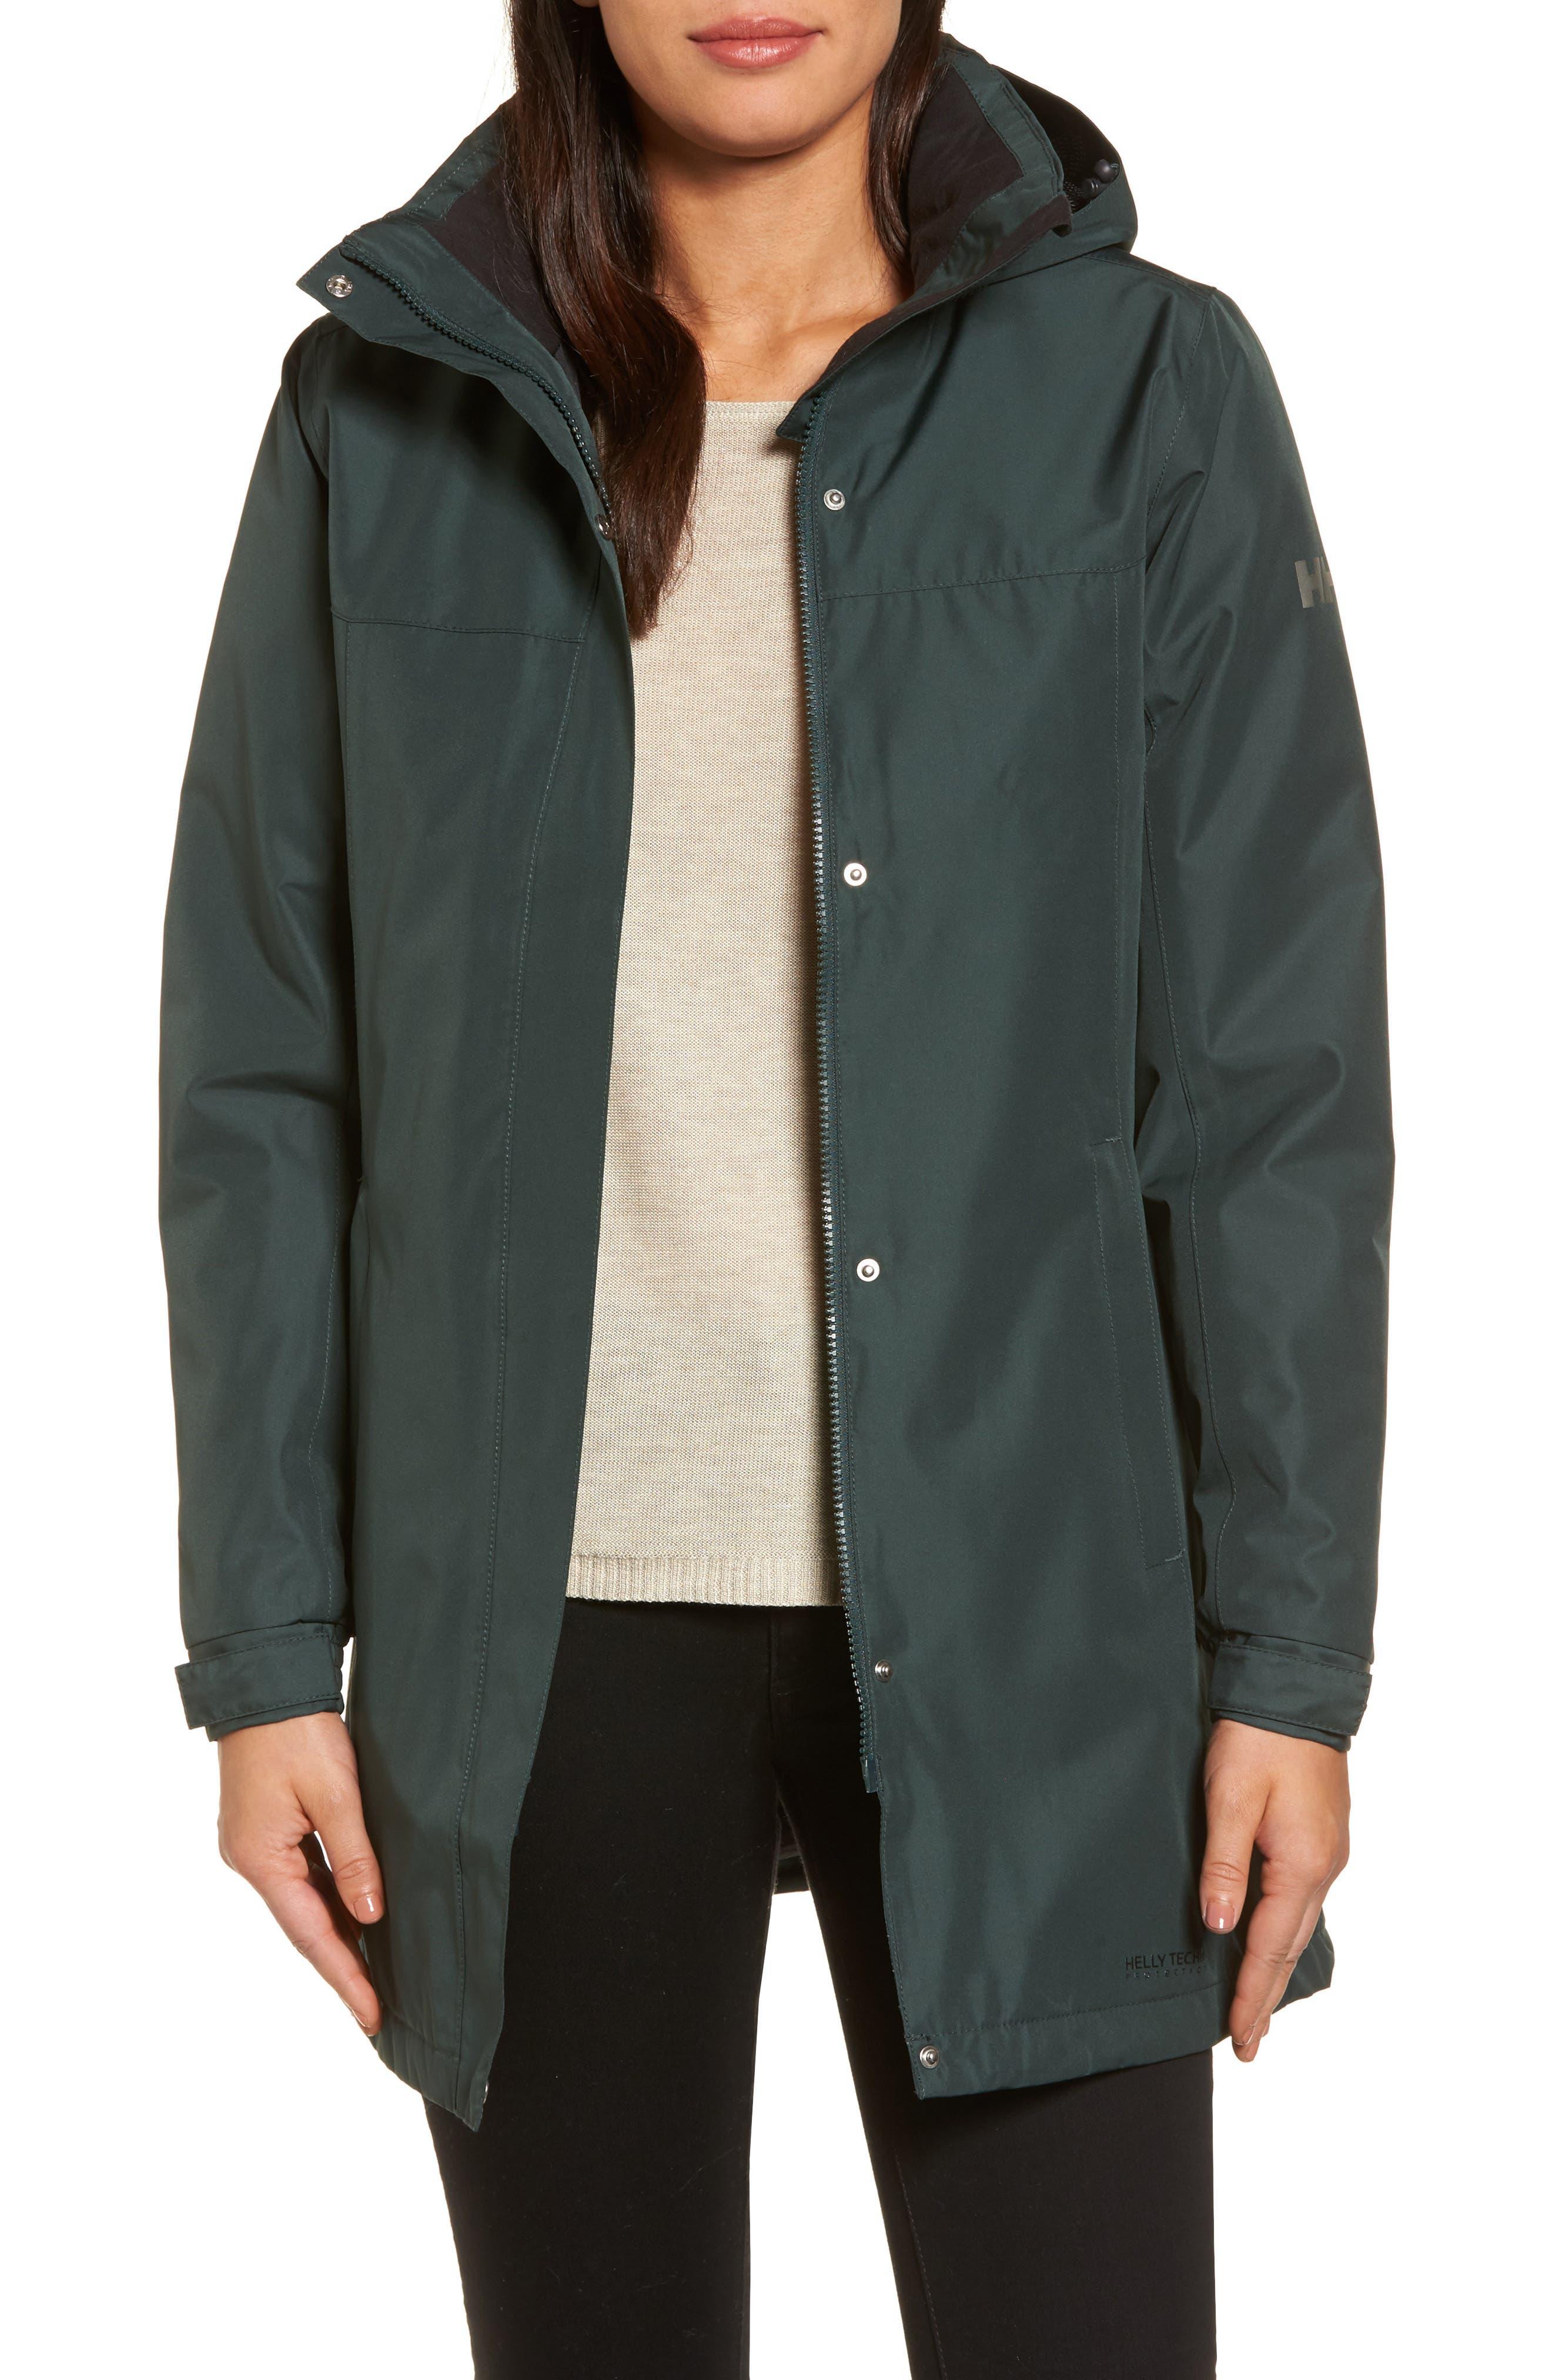 Main Image - Helly Hansen Aden Hooded Insulated Rain Jacket